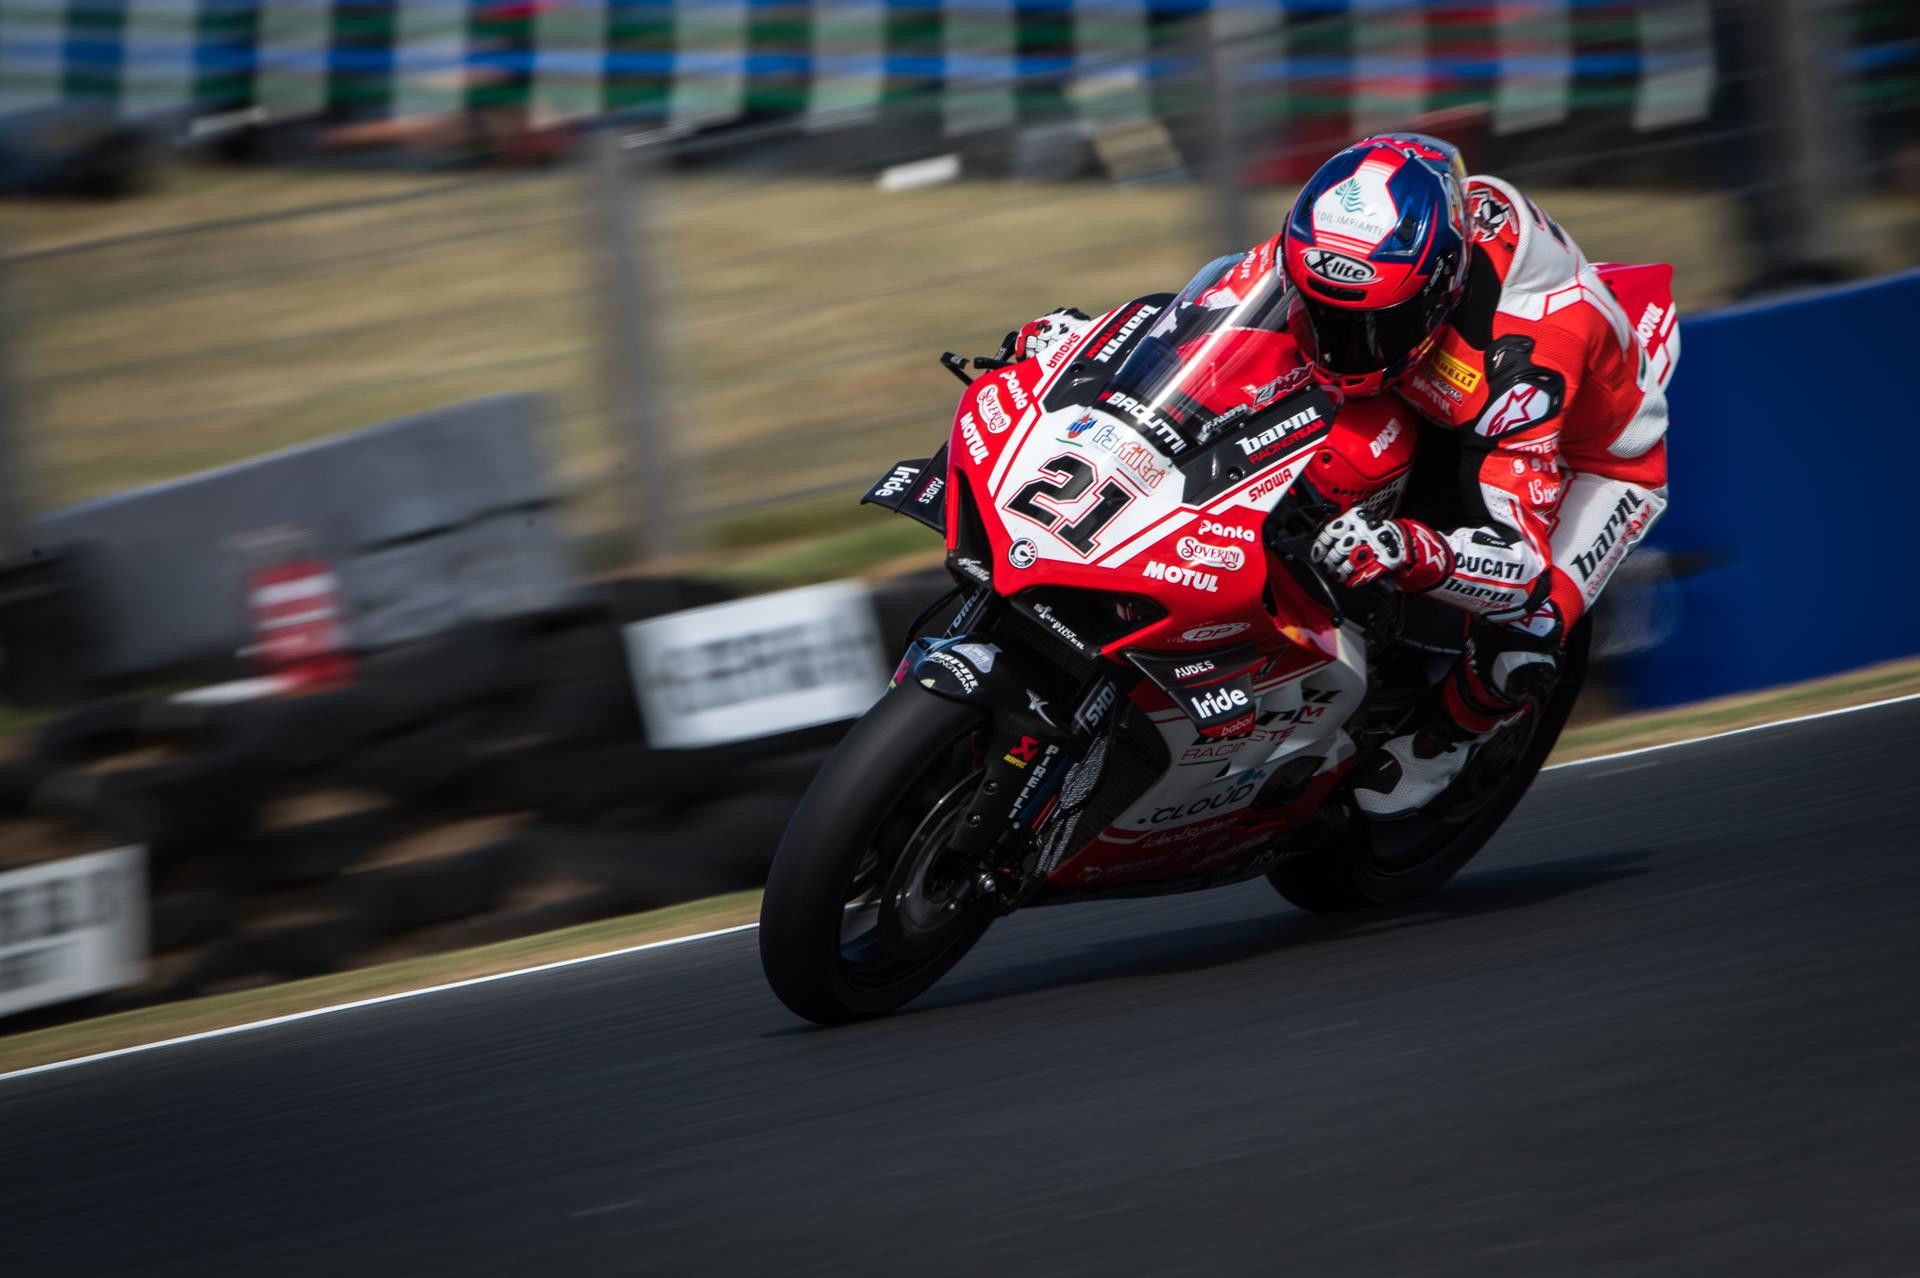 Michael Rinaldi (21), as seen on his Ducati Panigale V4 R during the 2019 season. Photo courtesy of Barni Racing Team.